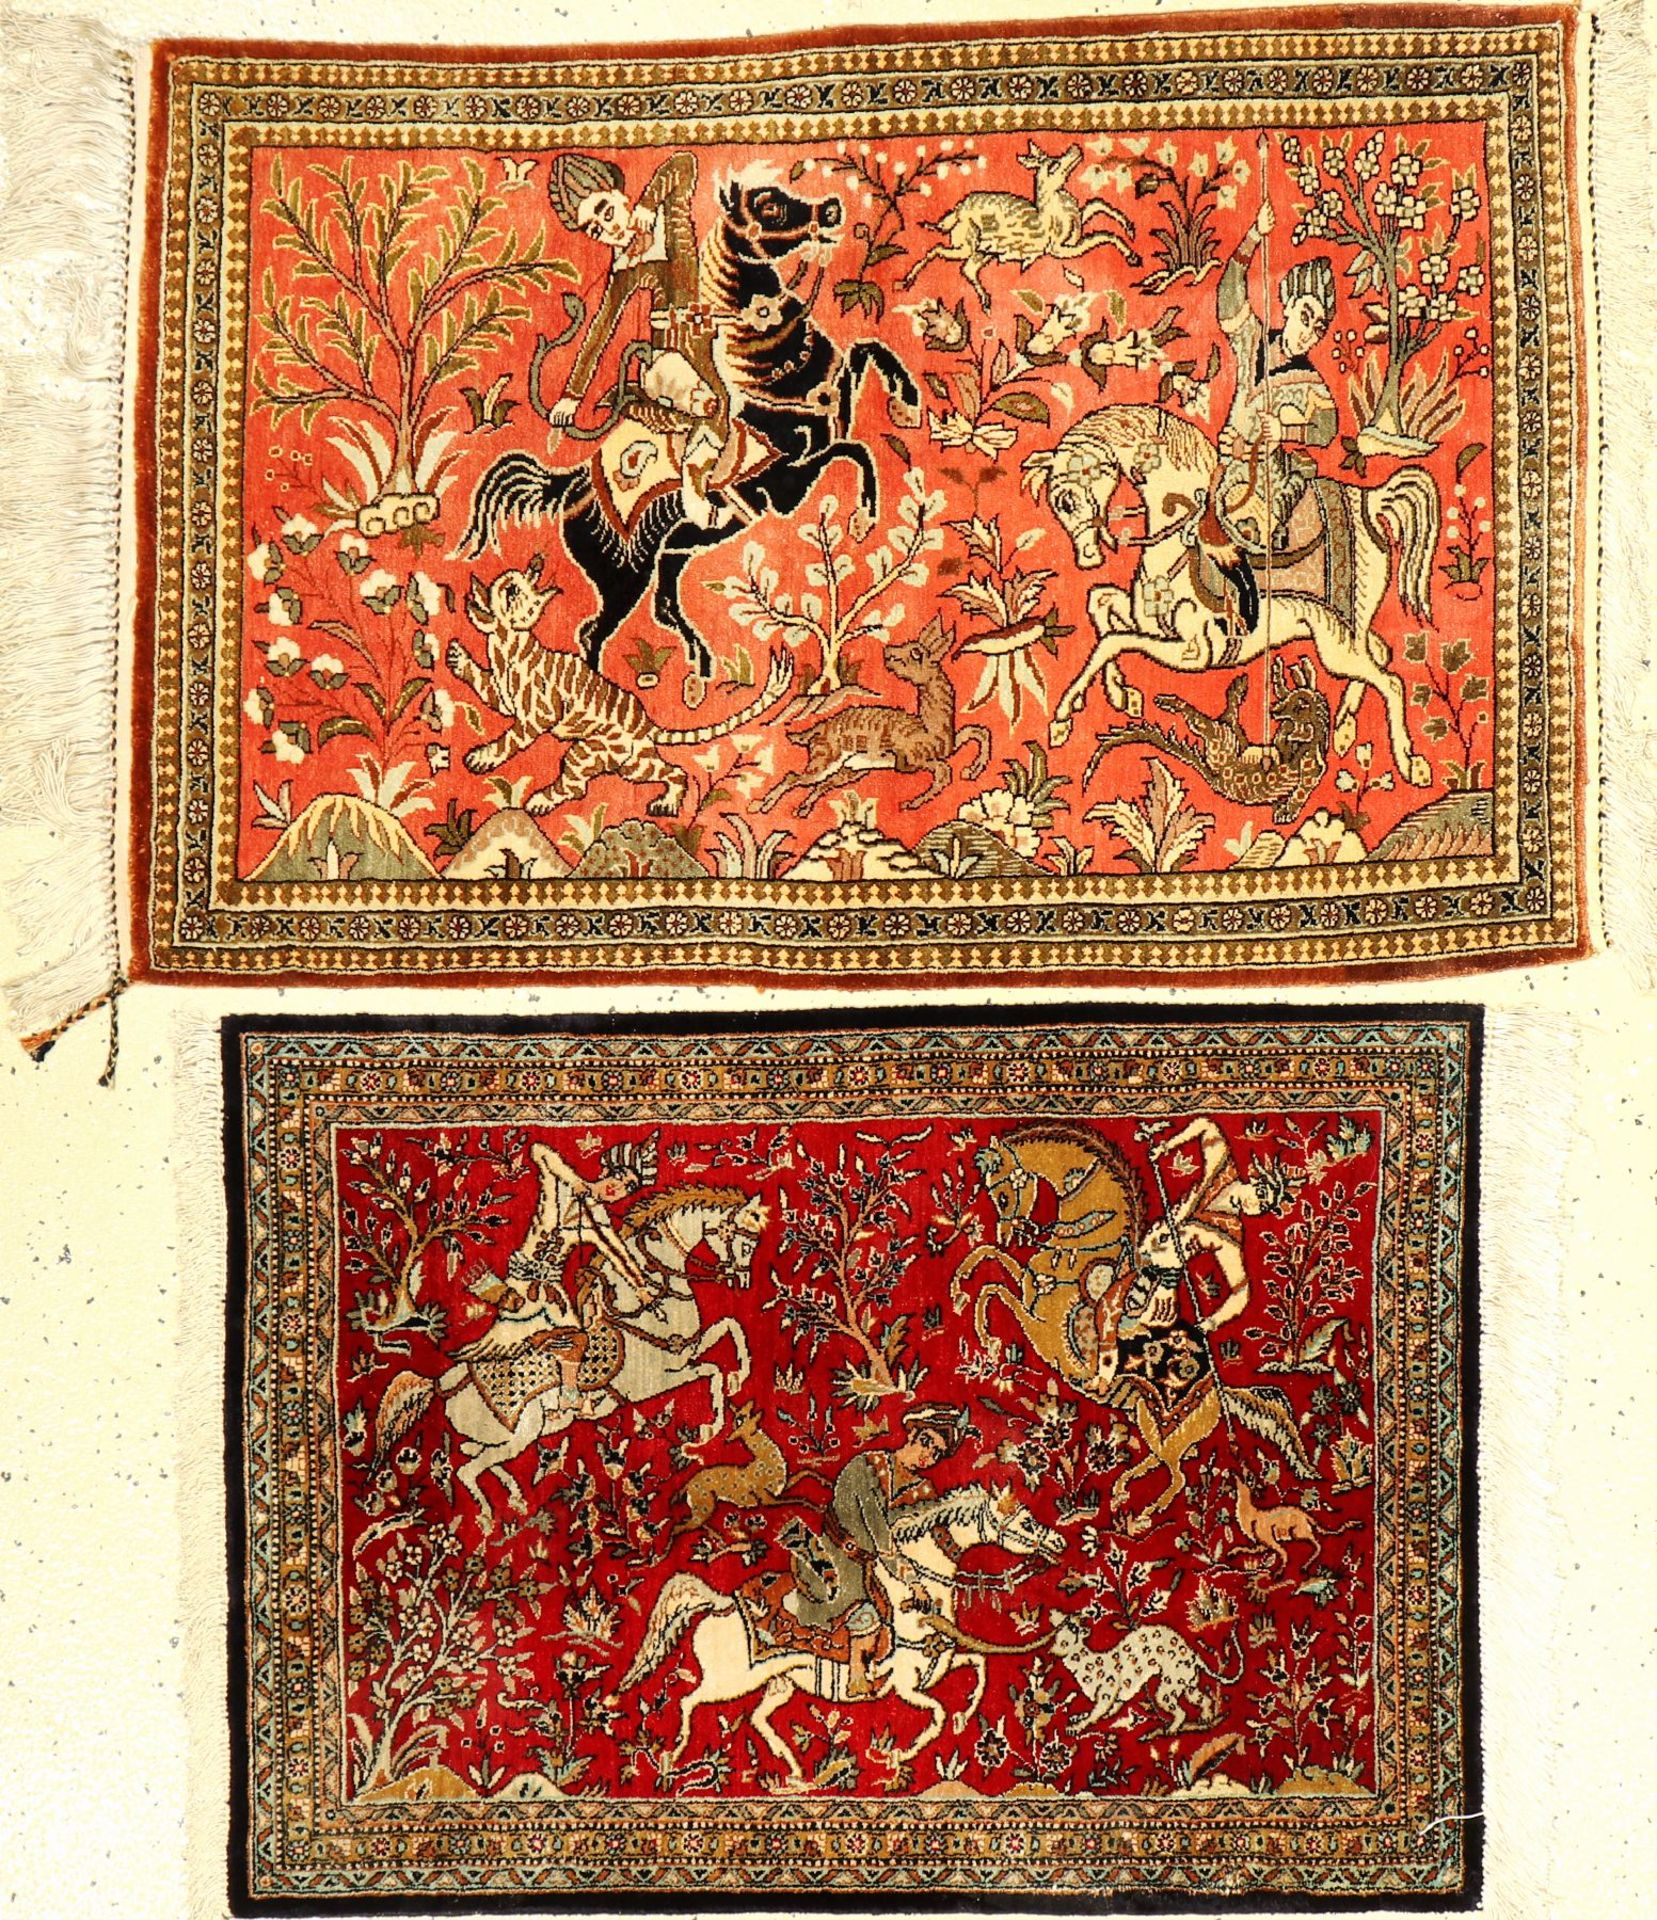 (2 Lots) 2x Seiden Ghom alt, Persien, ca. 50 Jahre, reine Naturseide, ca. 90 x 58 cm, ca. 77 x 56